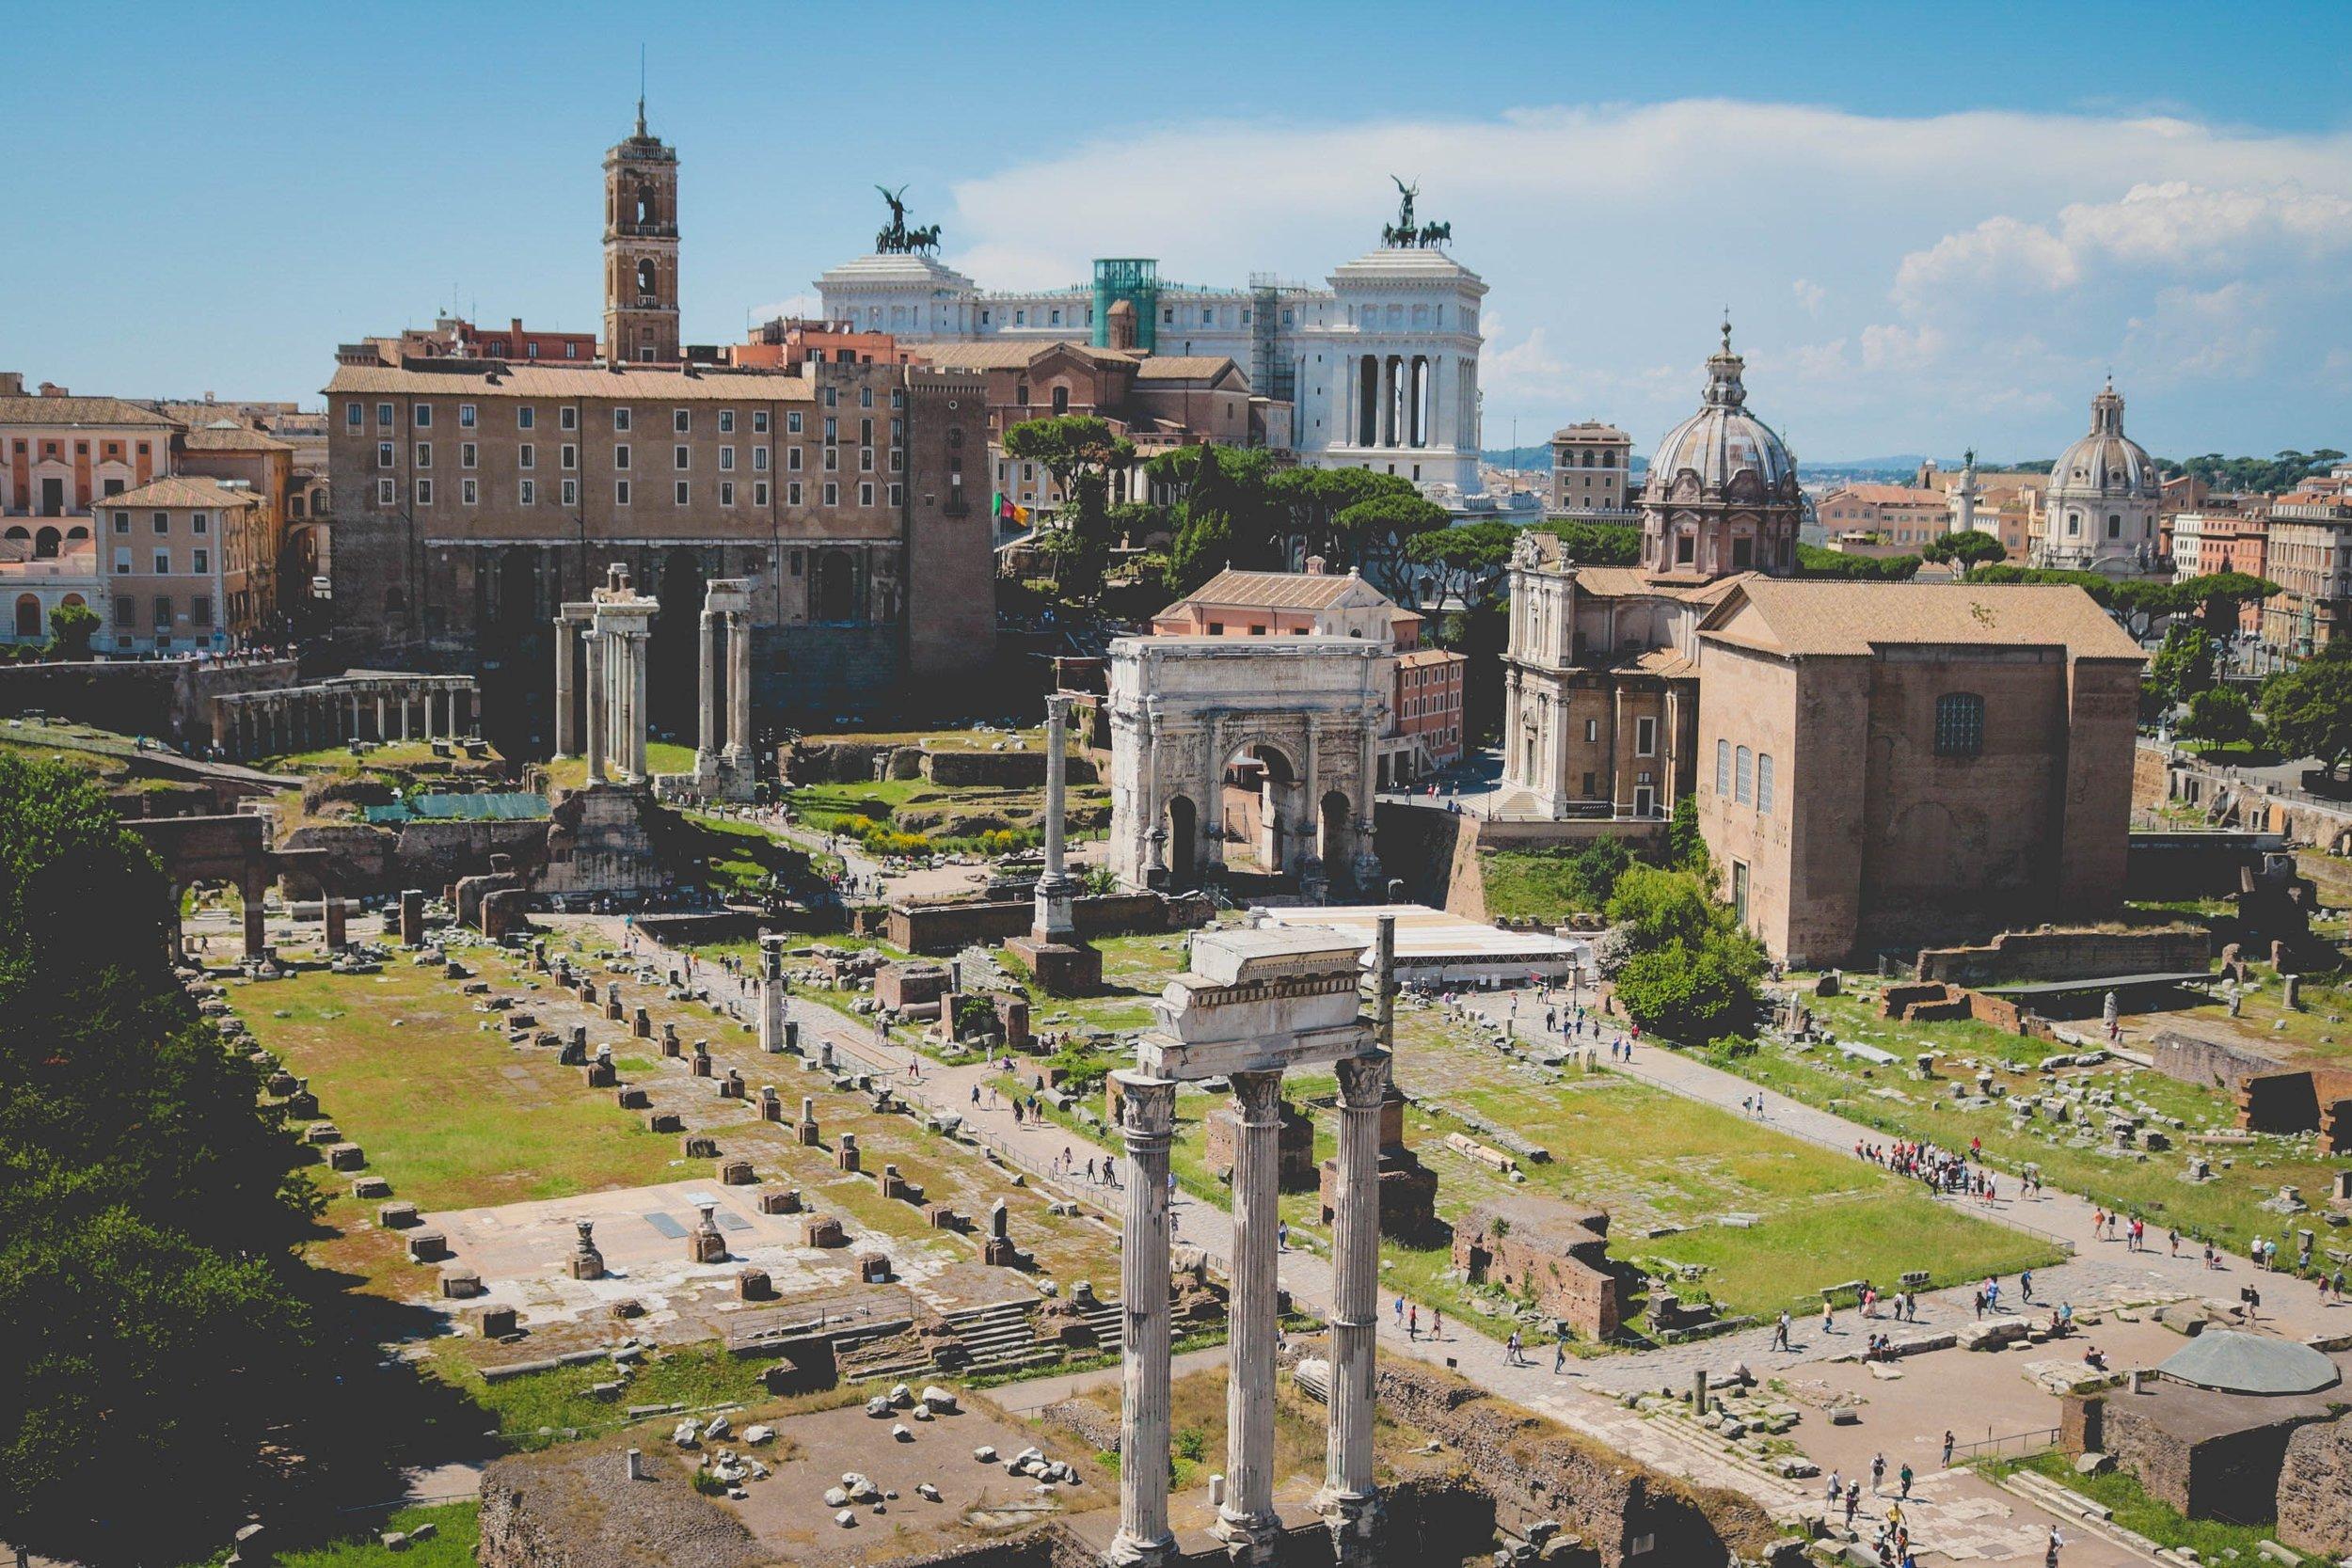 Tempio del Divo Claudio in Rome, Italy